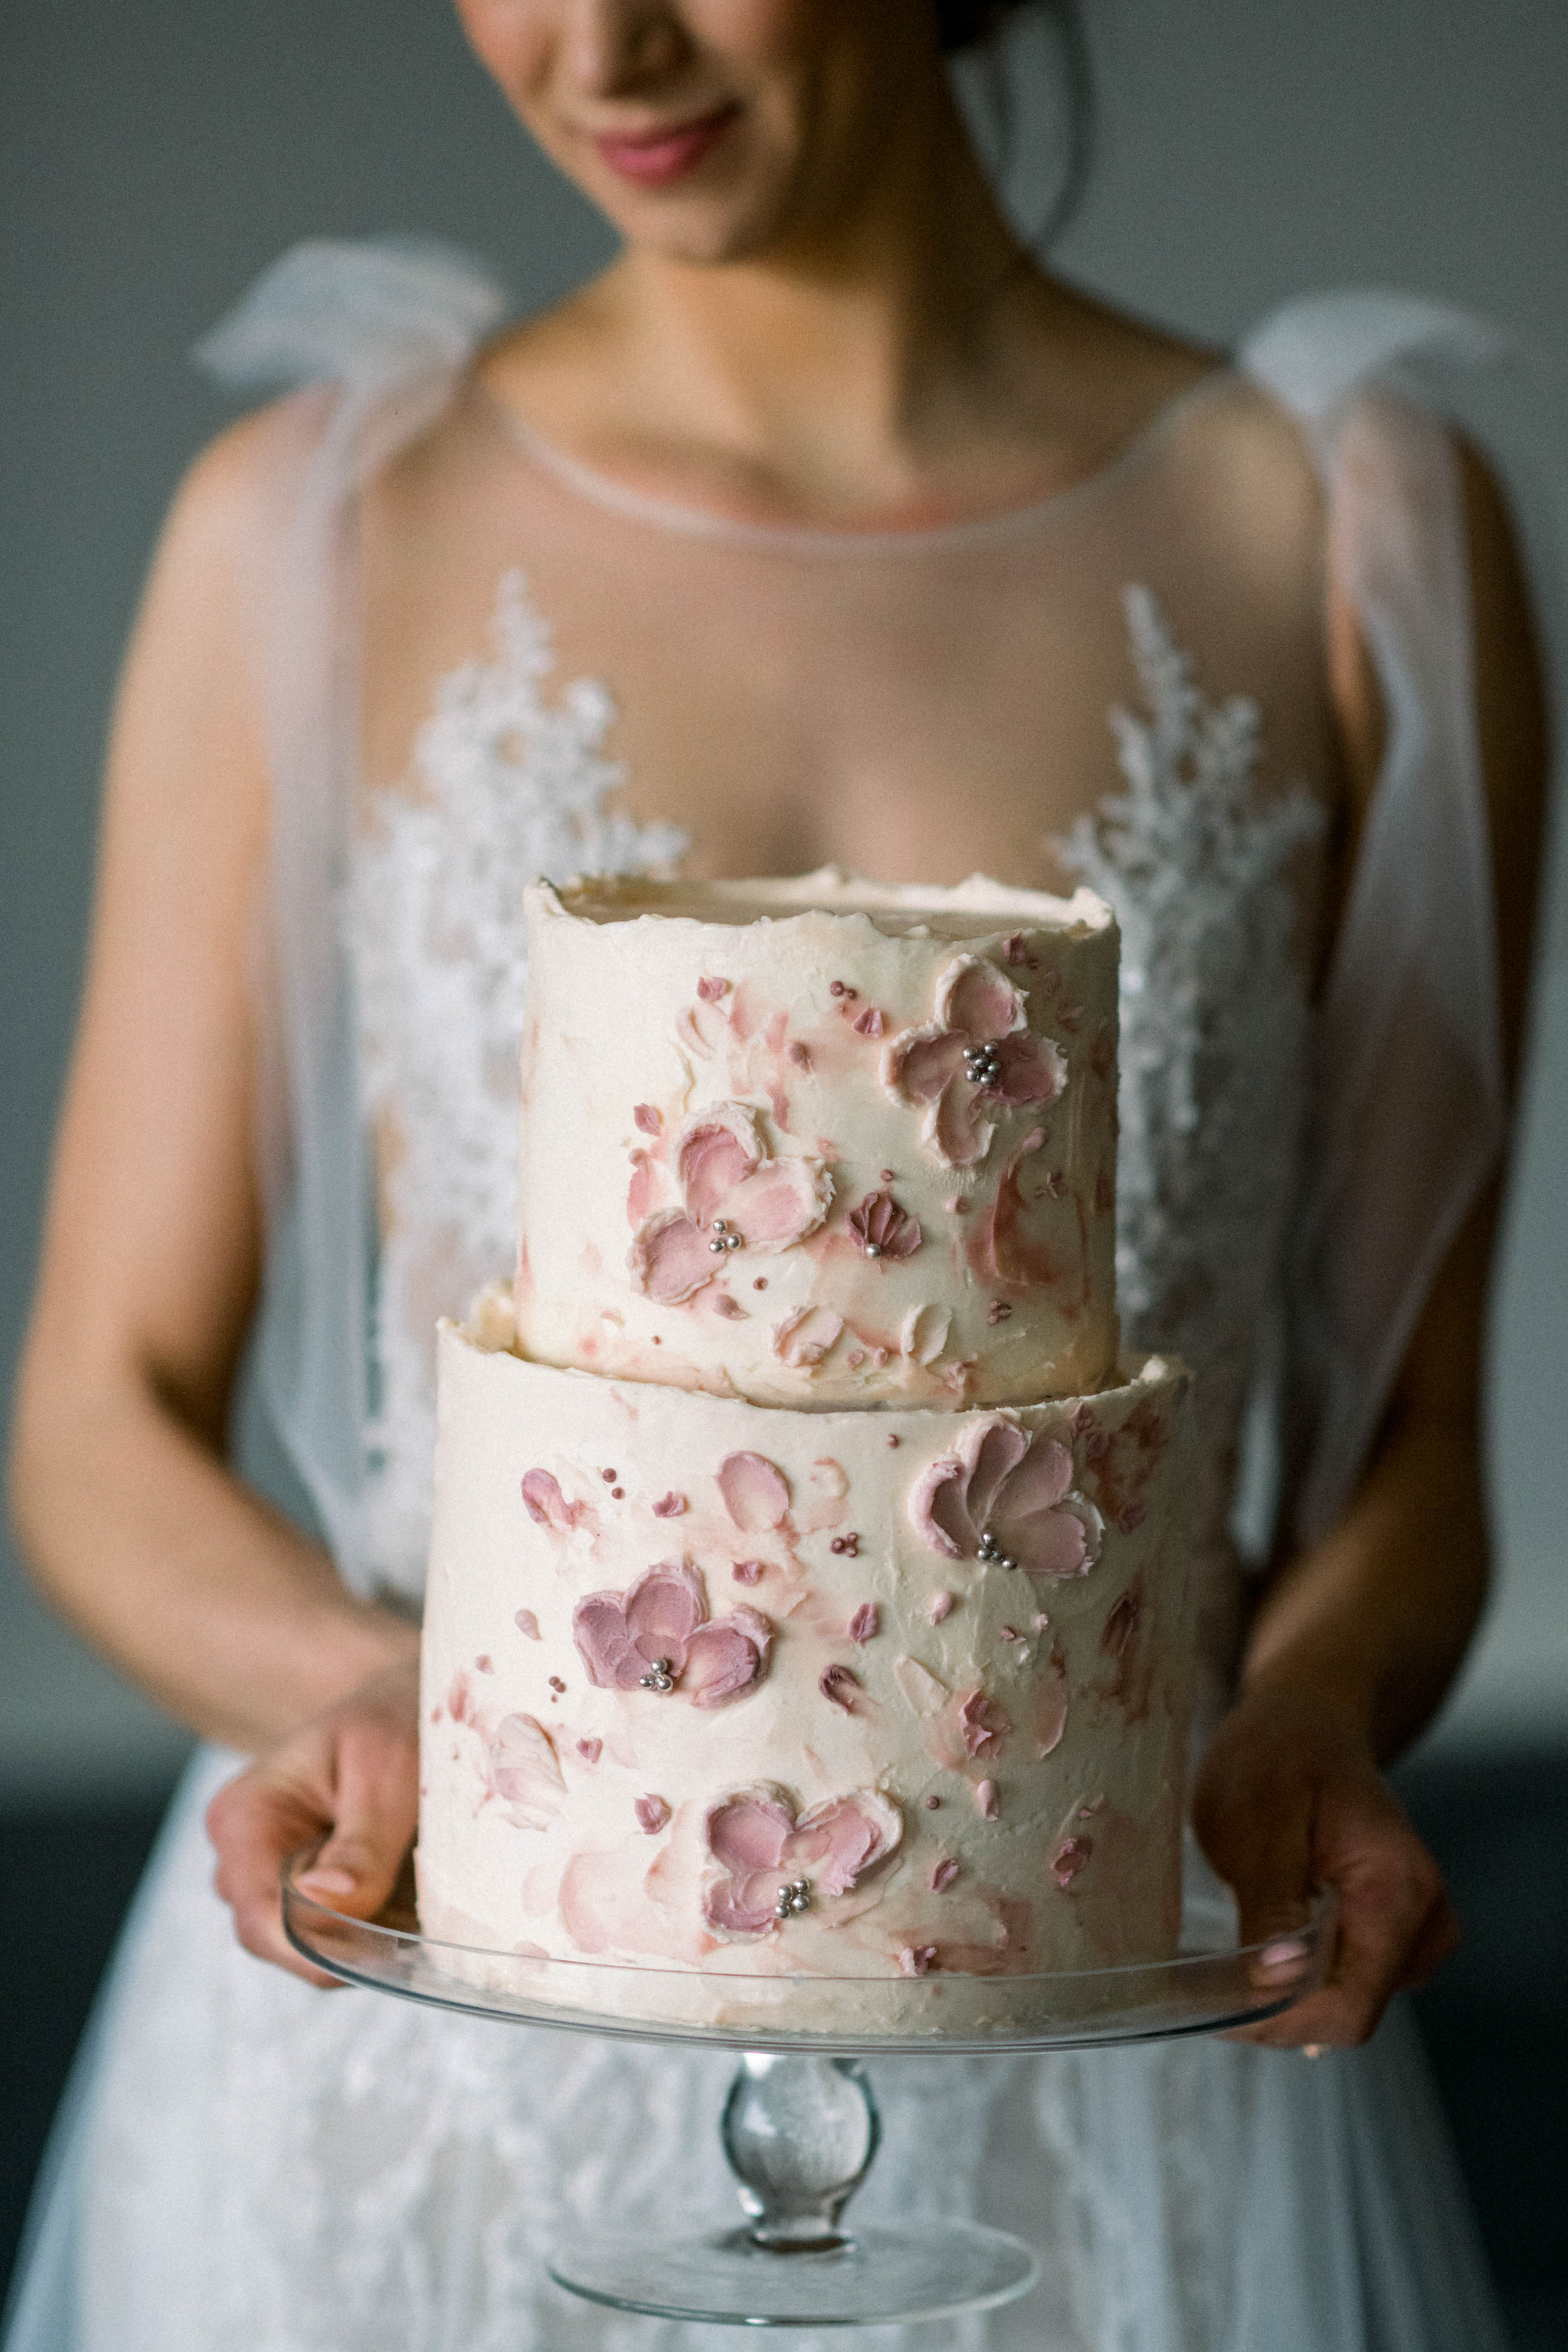 Spring Wedding - Romantic Whimsical Wedding | Exhale Events | Renaissance Hotel